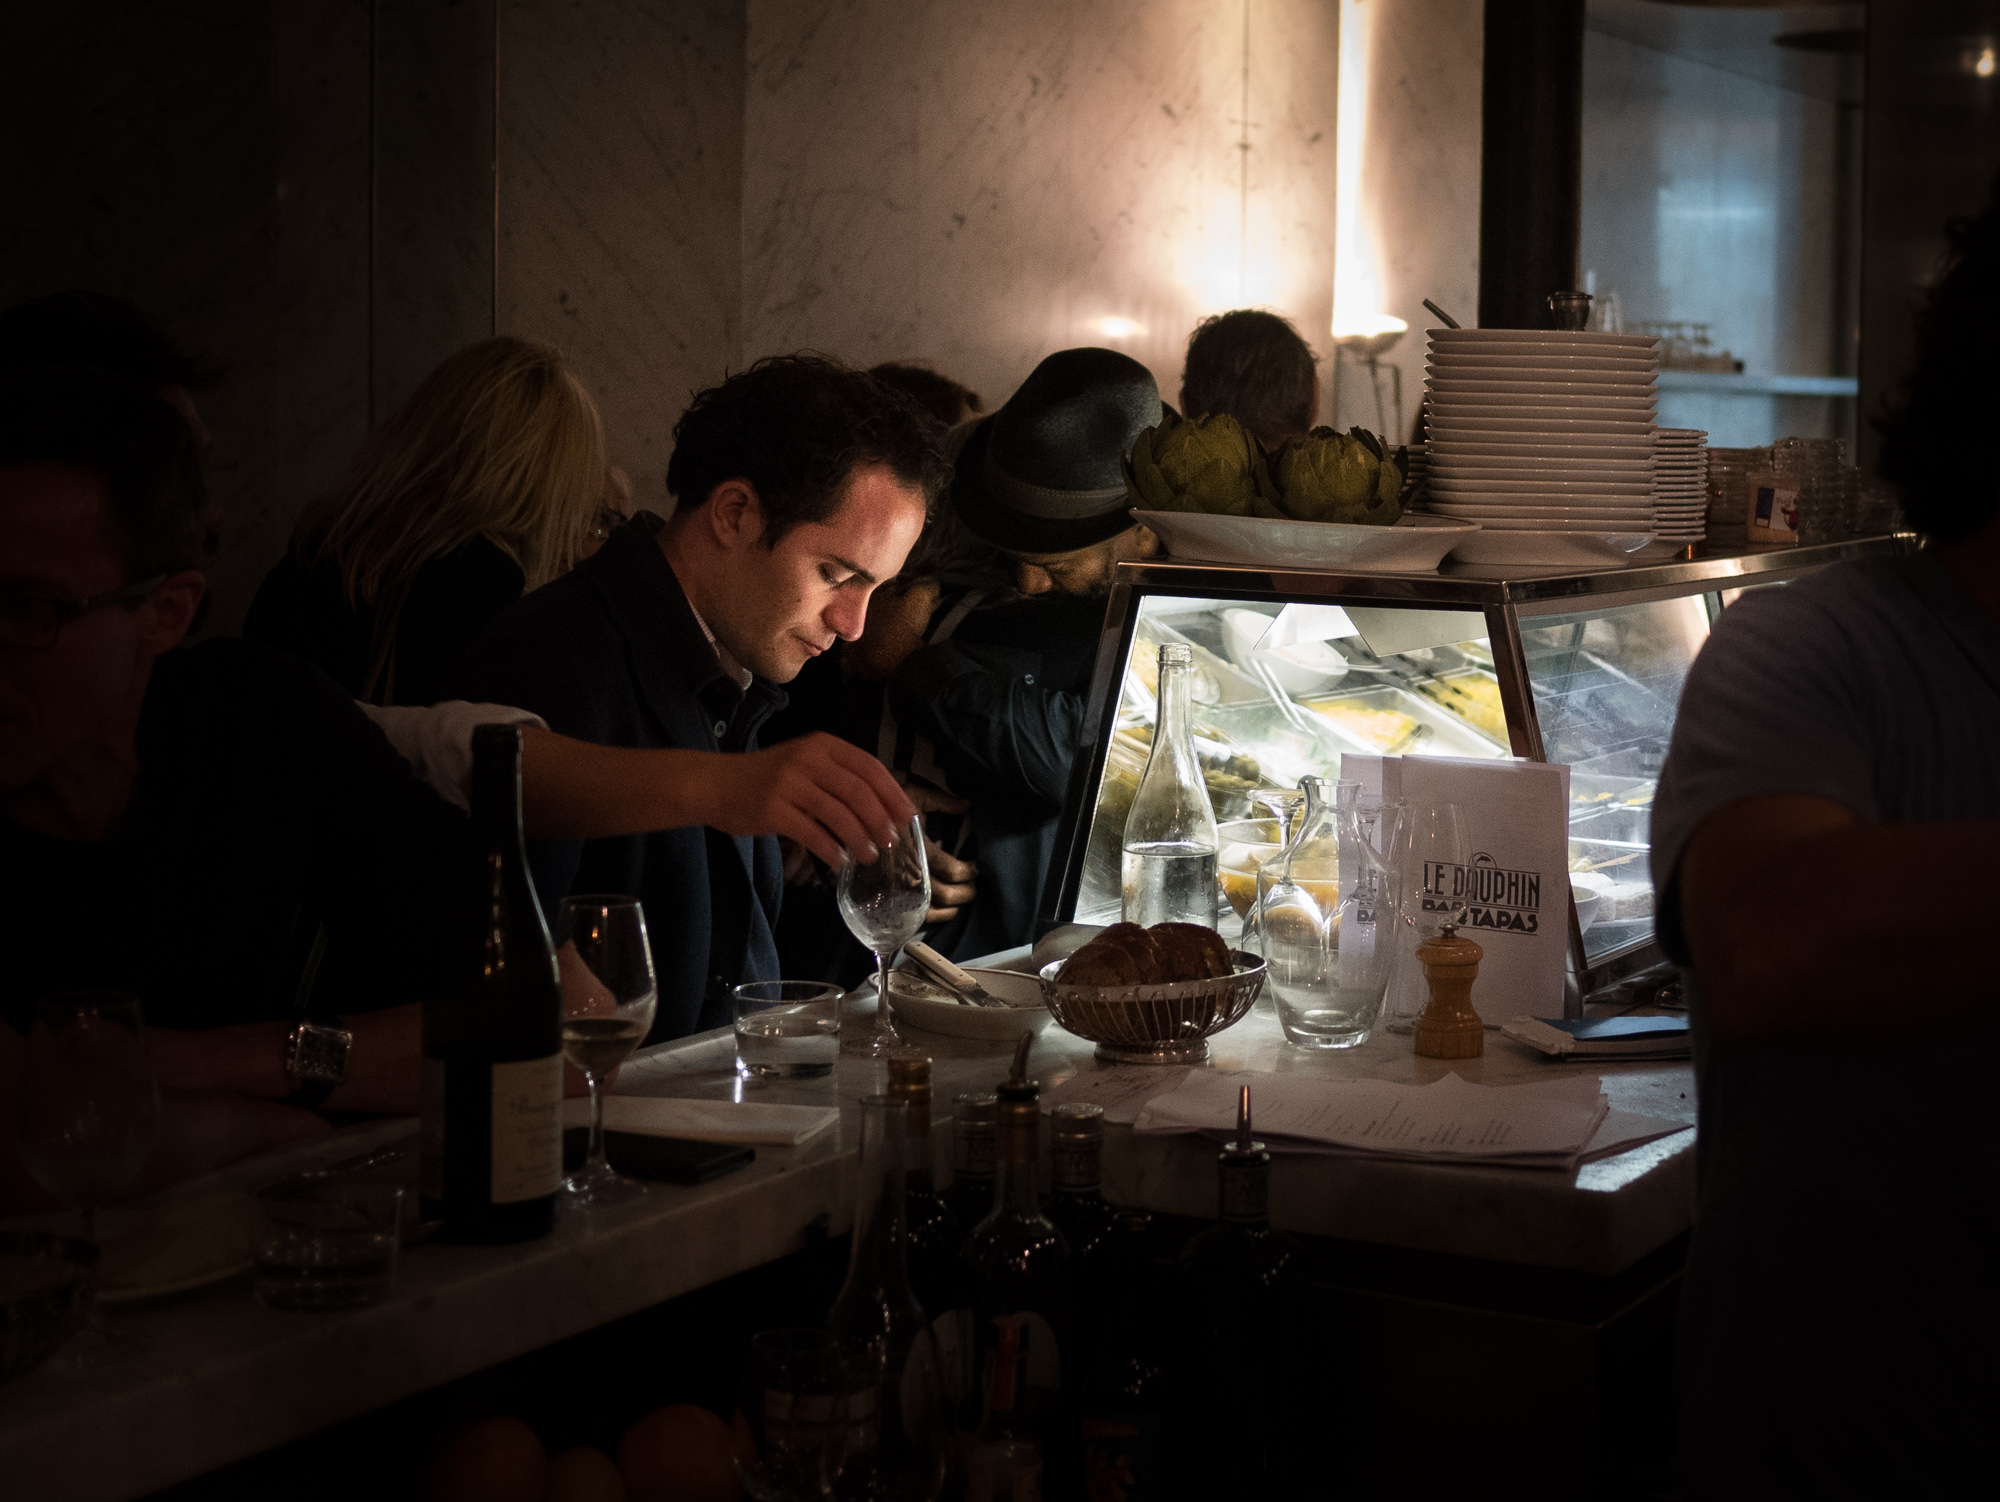 Paris, Bar, le Dauphin, food